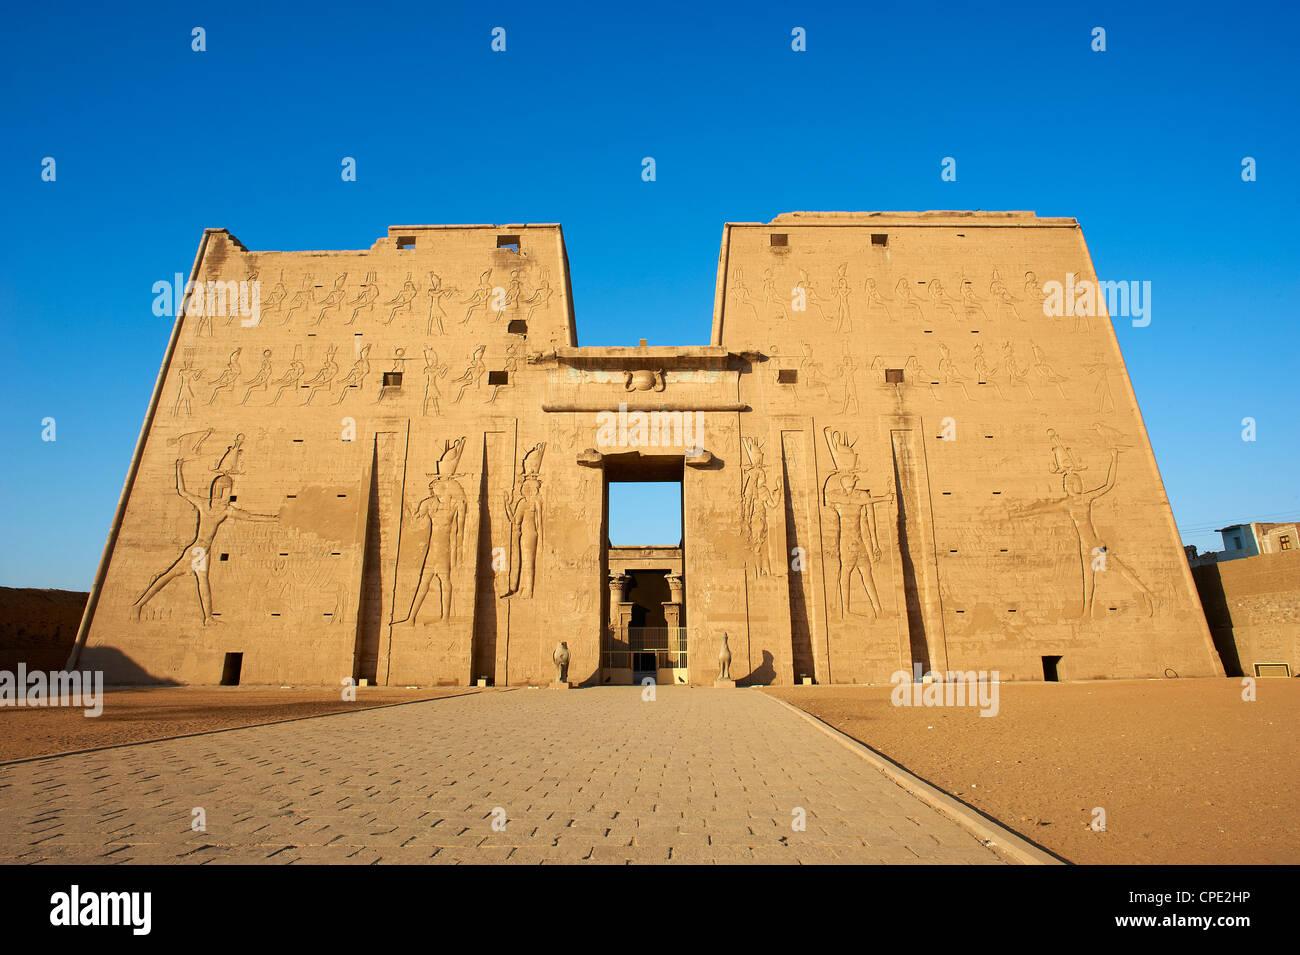 Pylon, Temple of Horus, Edfu, Egypt, North Africa, Africa - Stock Image